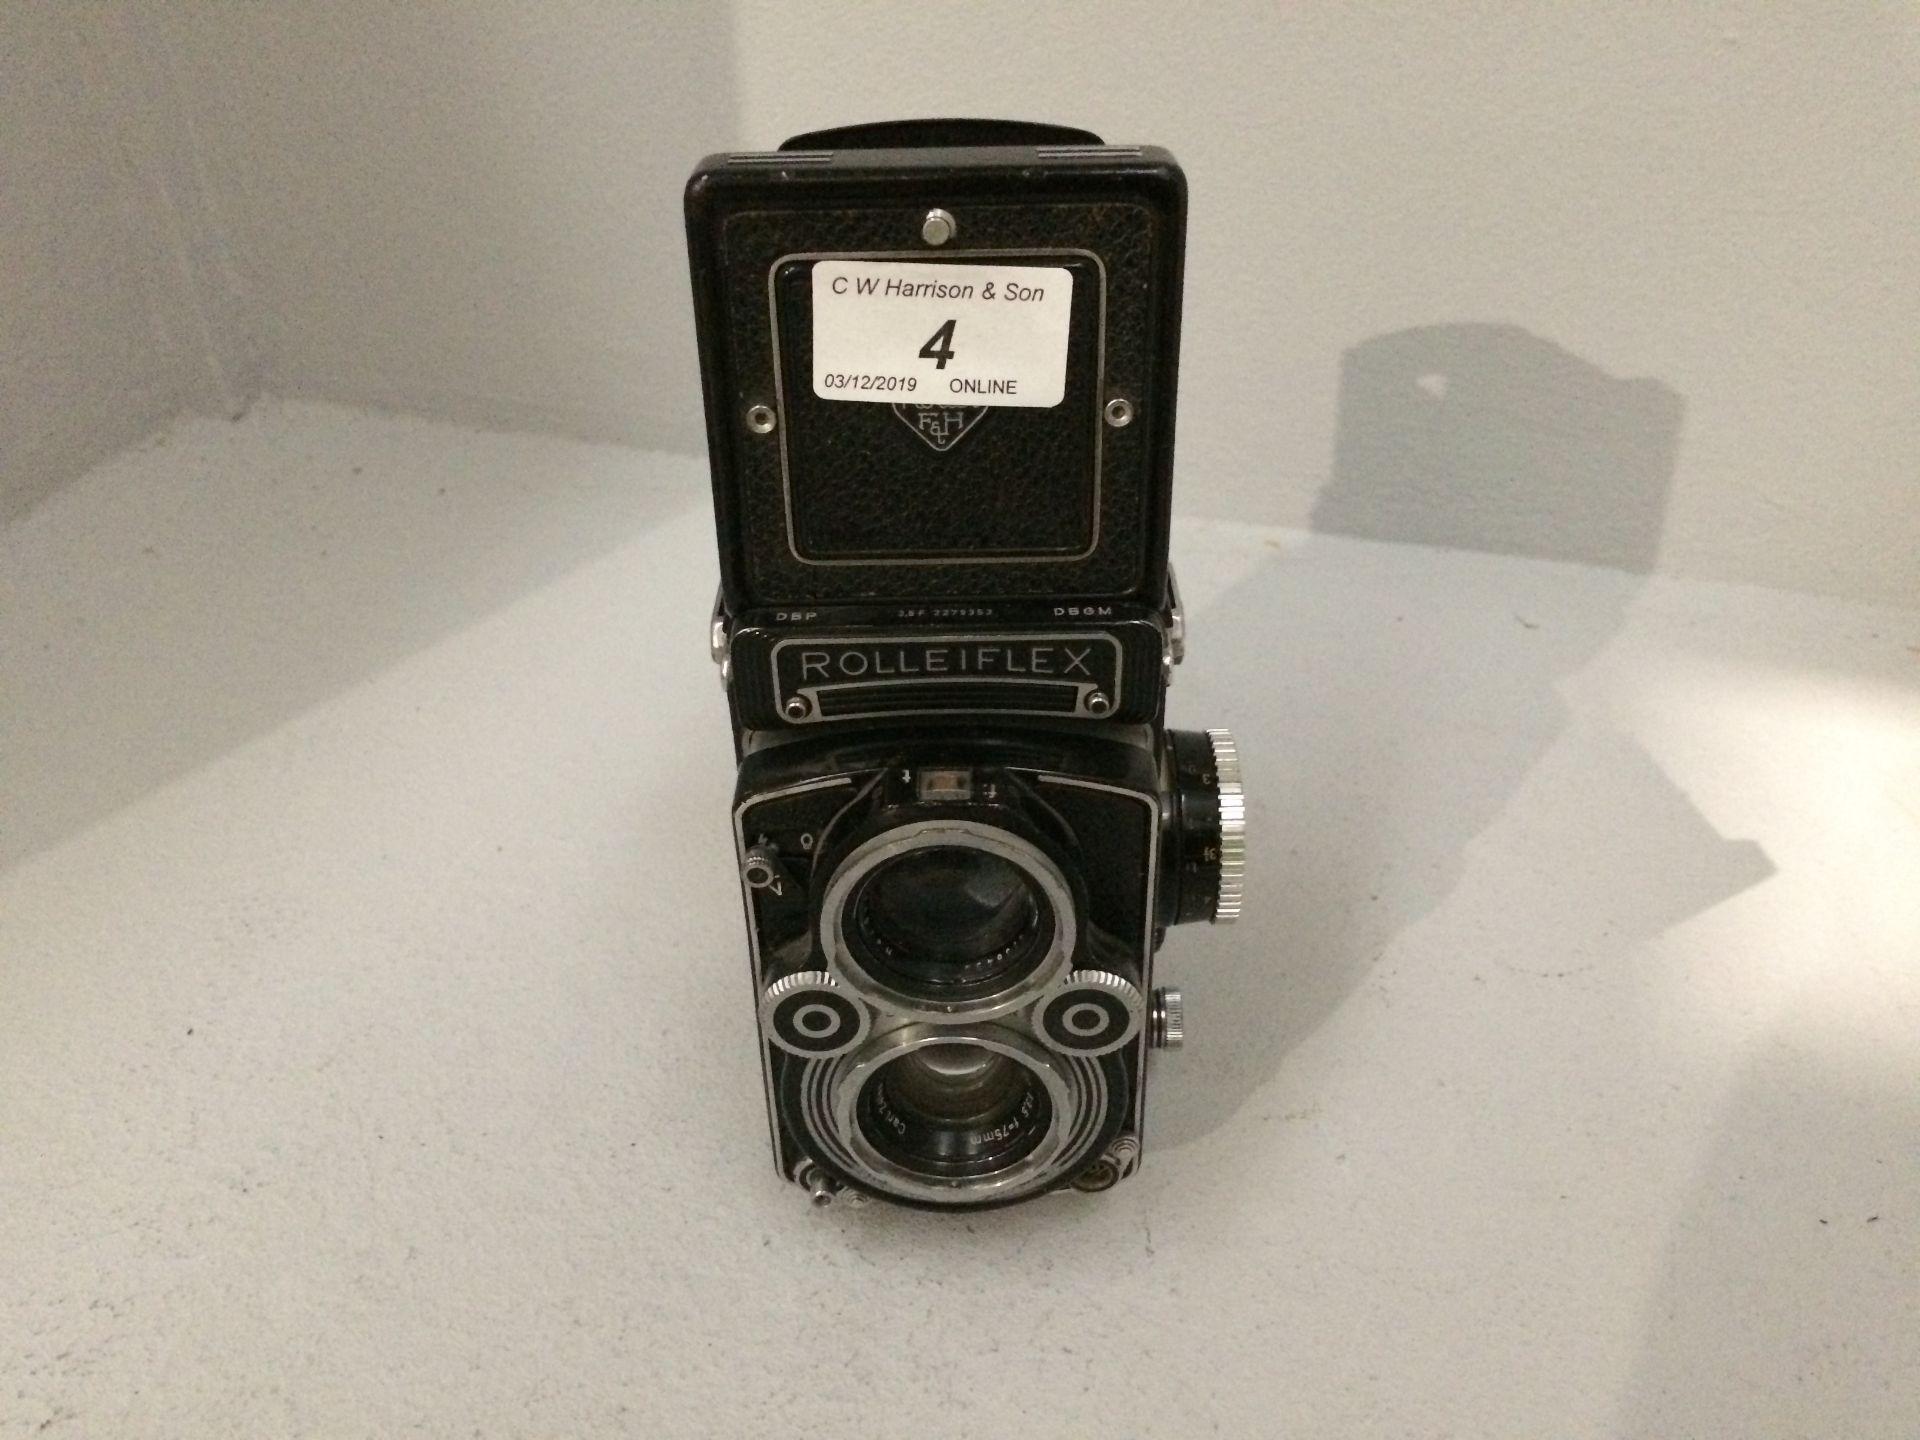 Lot 4 - Rolleiflex Franke & Heidecke film camera, 1..